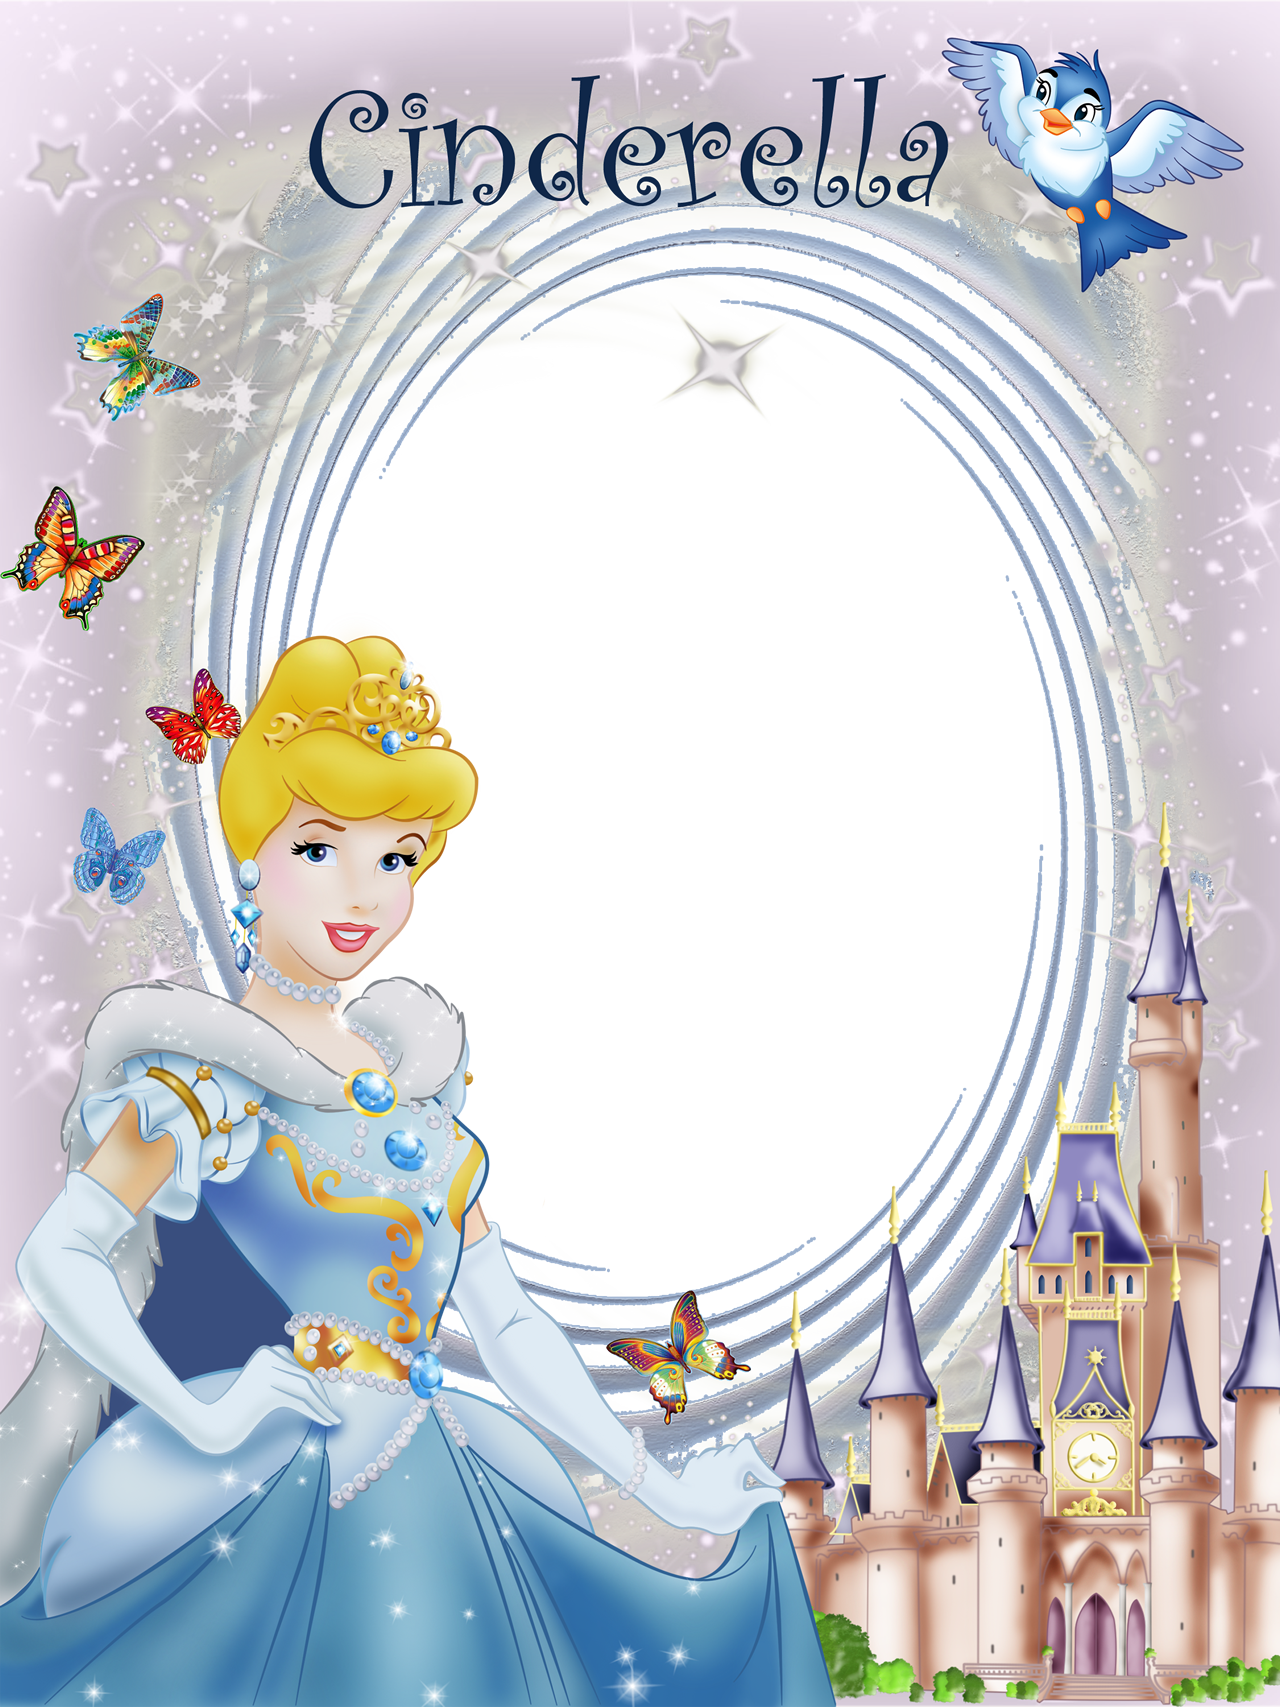 Cinderella clipart frame. Transparent princess gallery yopriceville